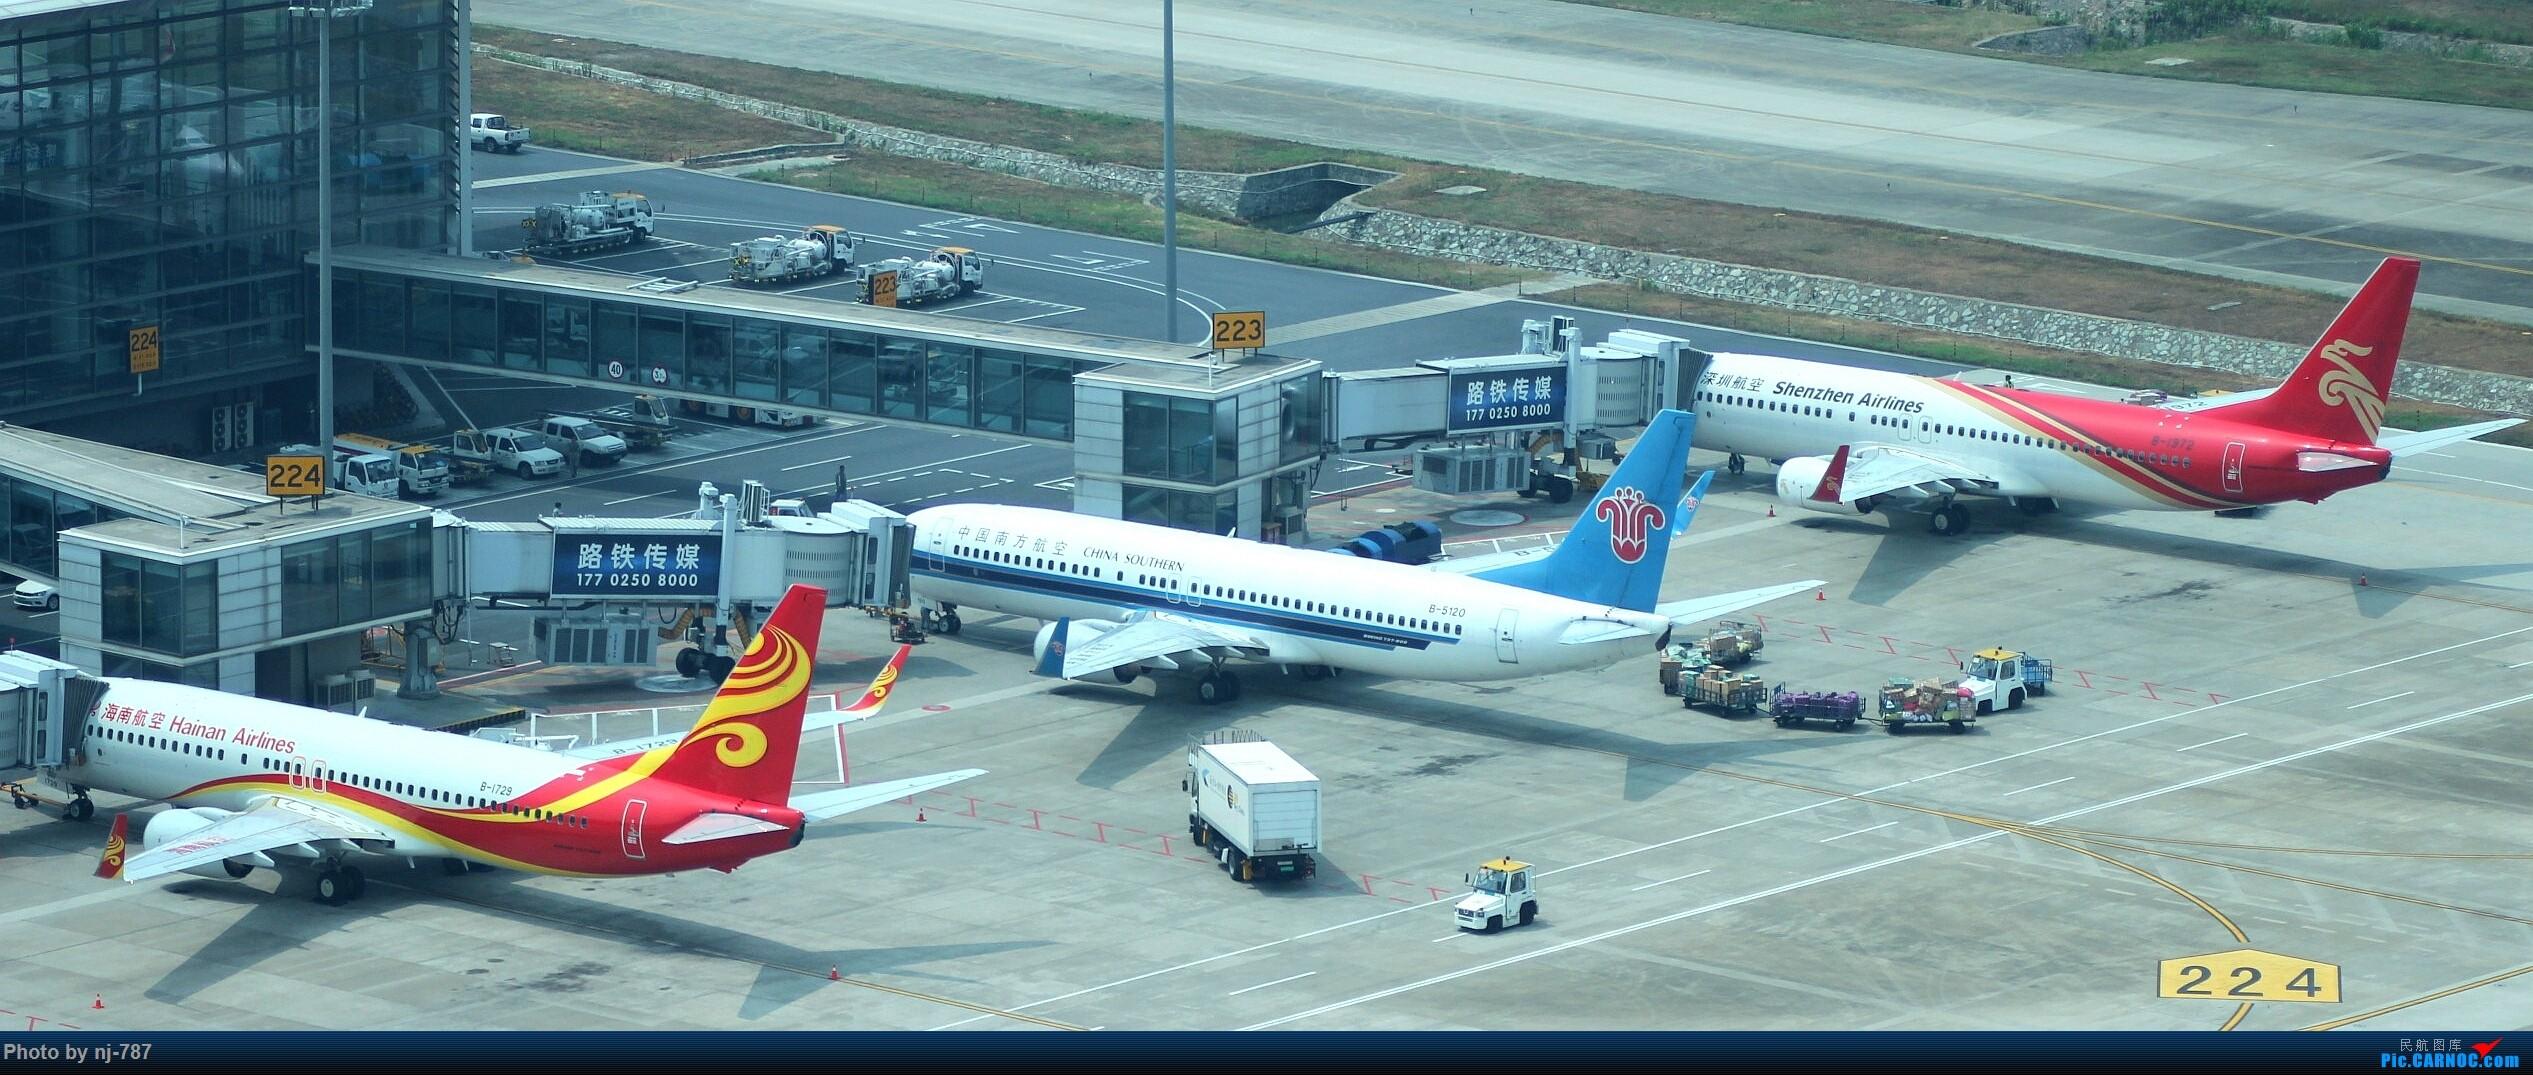 Re:[原创]站得高,看得远!NKG双跑,T2启用后初踏!    中国南京禄口国际机场